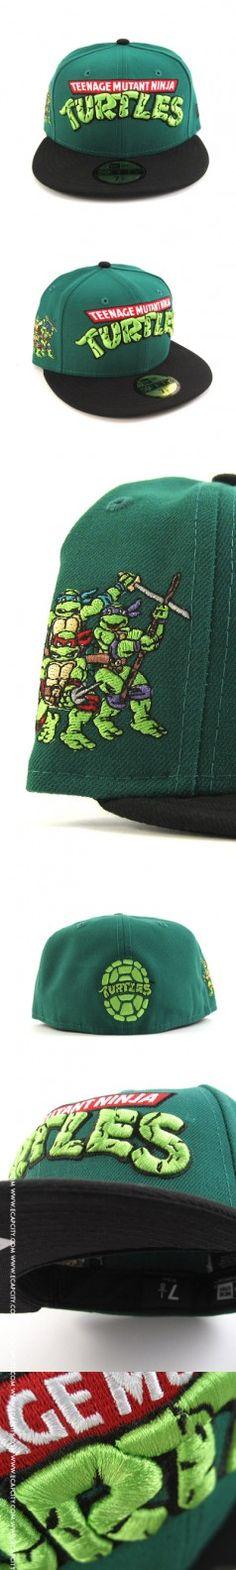 bdbab8481c7 Teenage Mutant Ninja Turtles New Era Fitted Hats (GREEN BLACK) – Custom  Fitteds